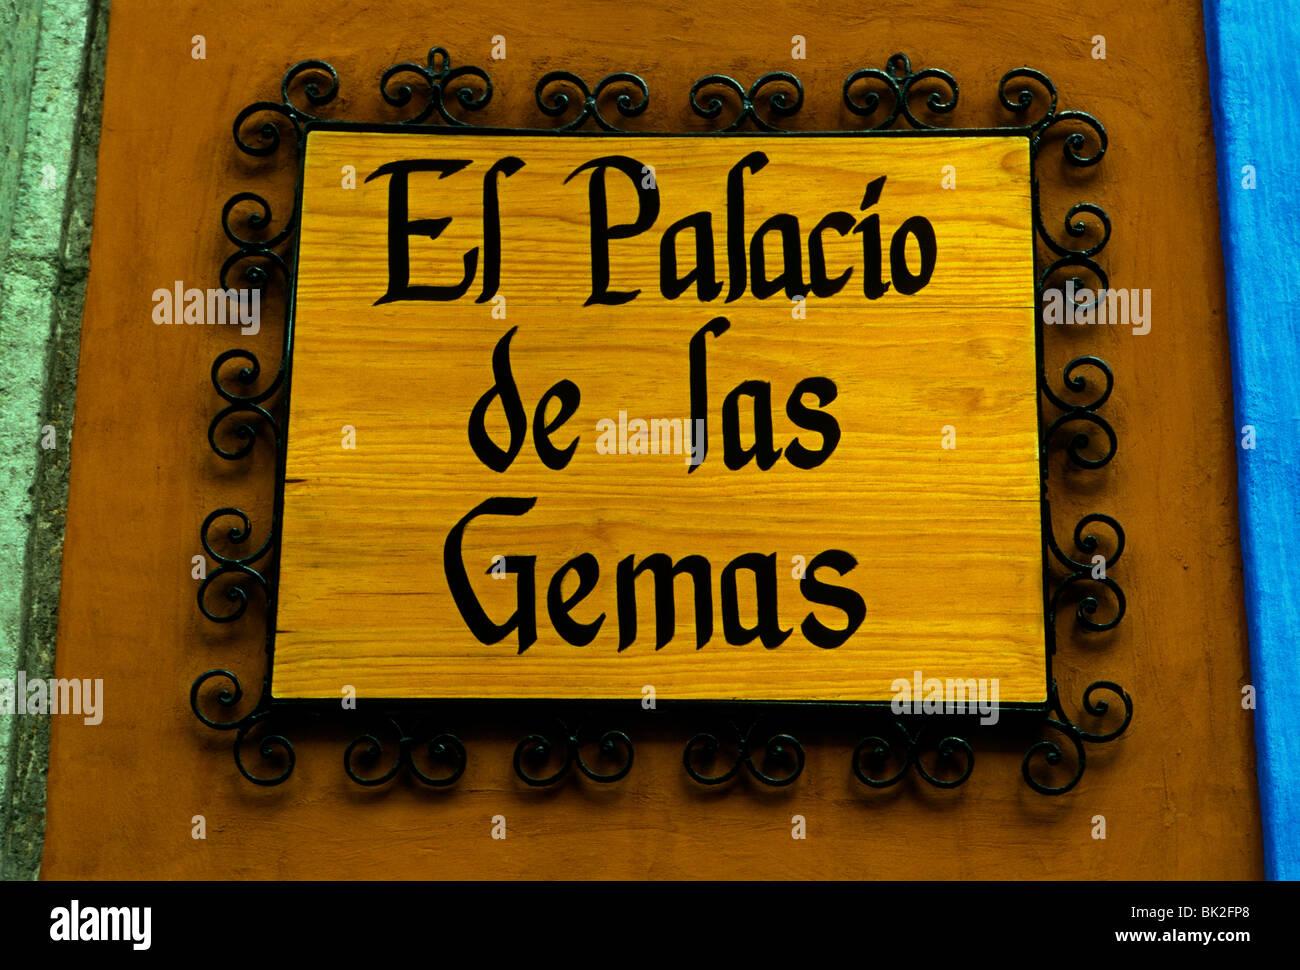 El Palacio de las Gemas, gioielleria, Calle Macedenio Alcala, Alcala Street, Città Capitale, Oaxaca de Juarez, Oaxaca, Stato di Oaxaca, Messico Foto Stock